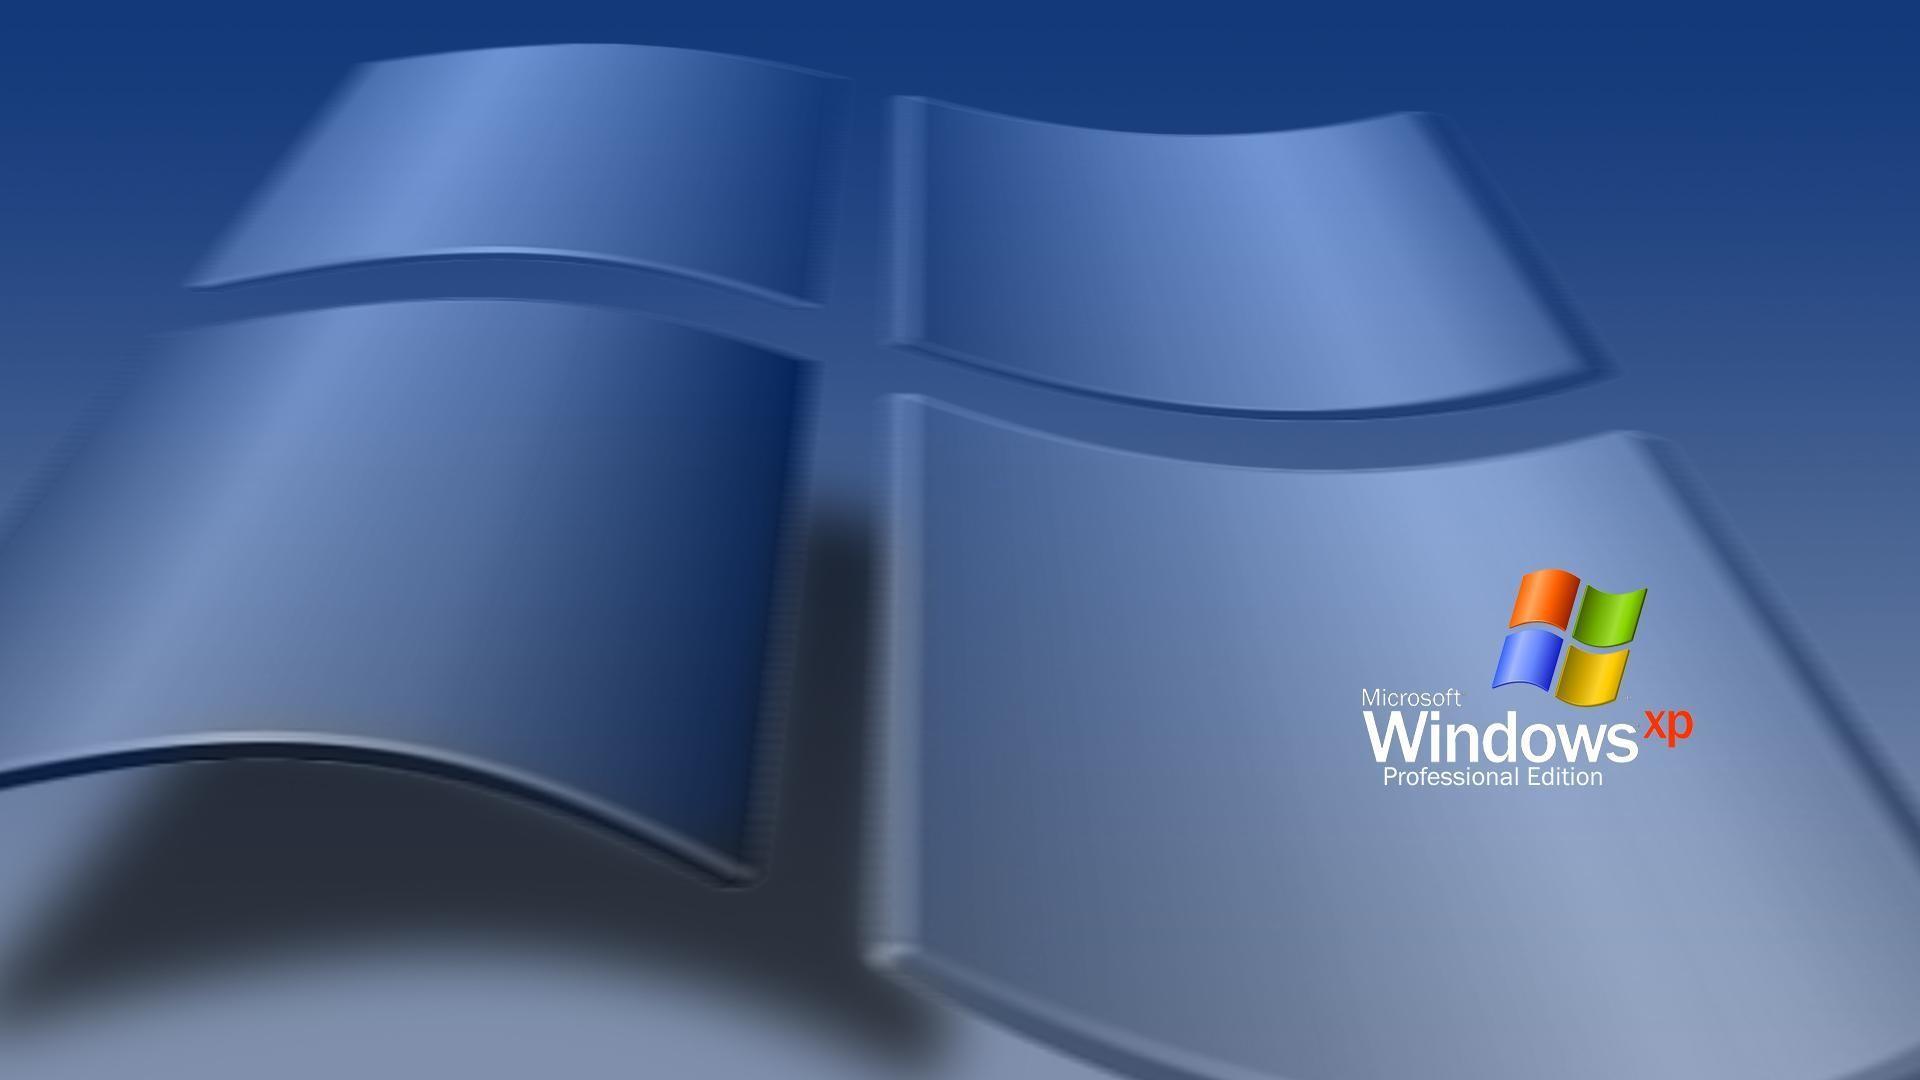 Windows xp wallpaper original download